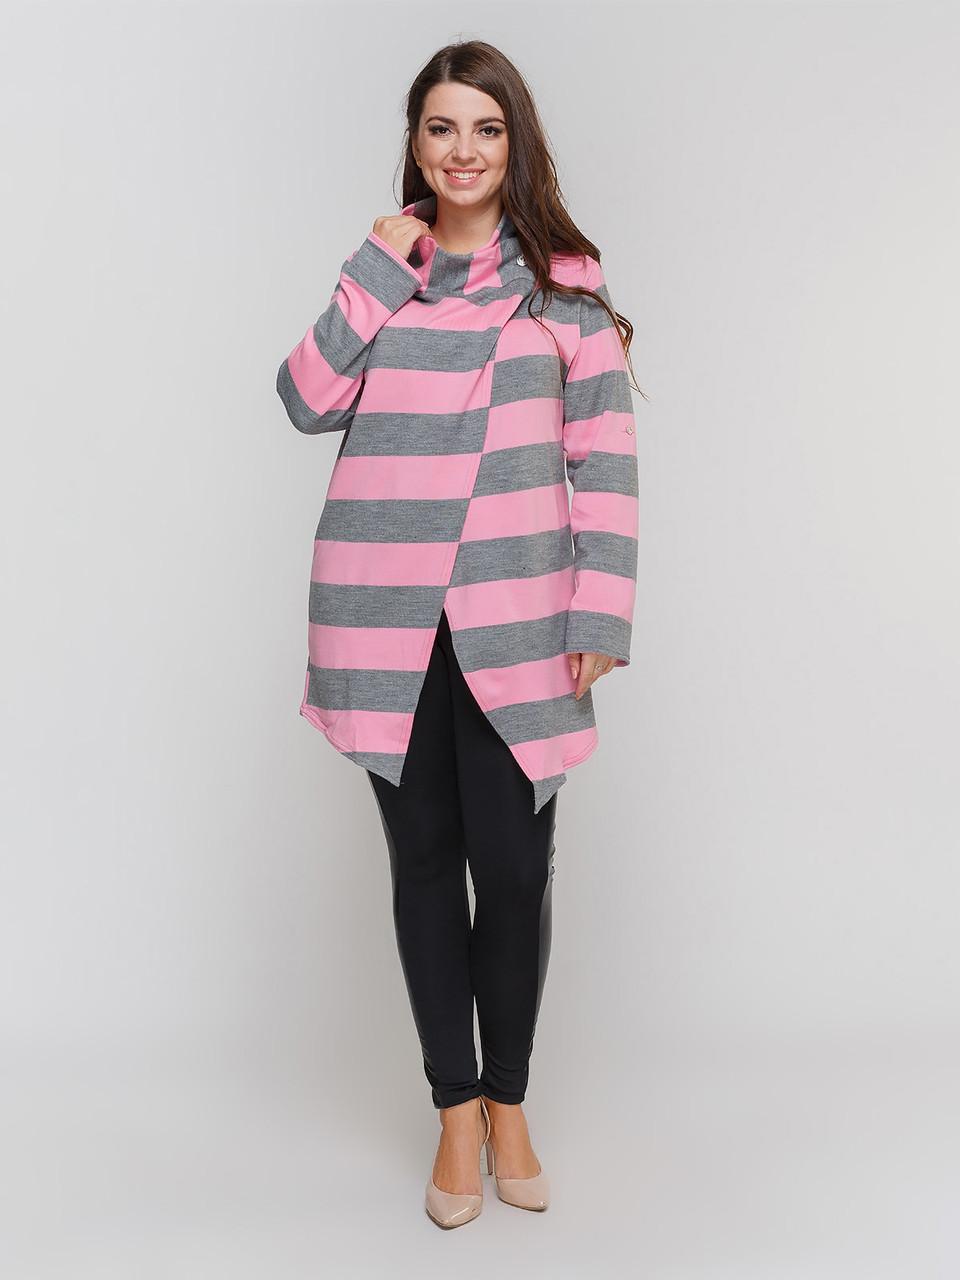 Кардиган LiLove 4195 розовый  54-56